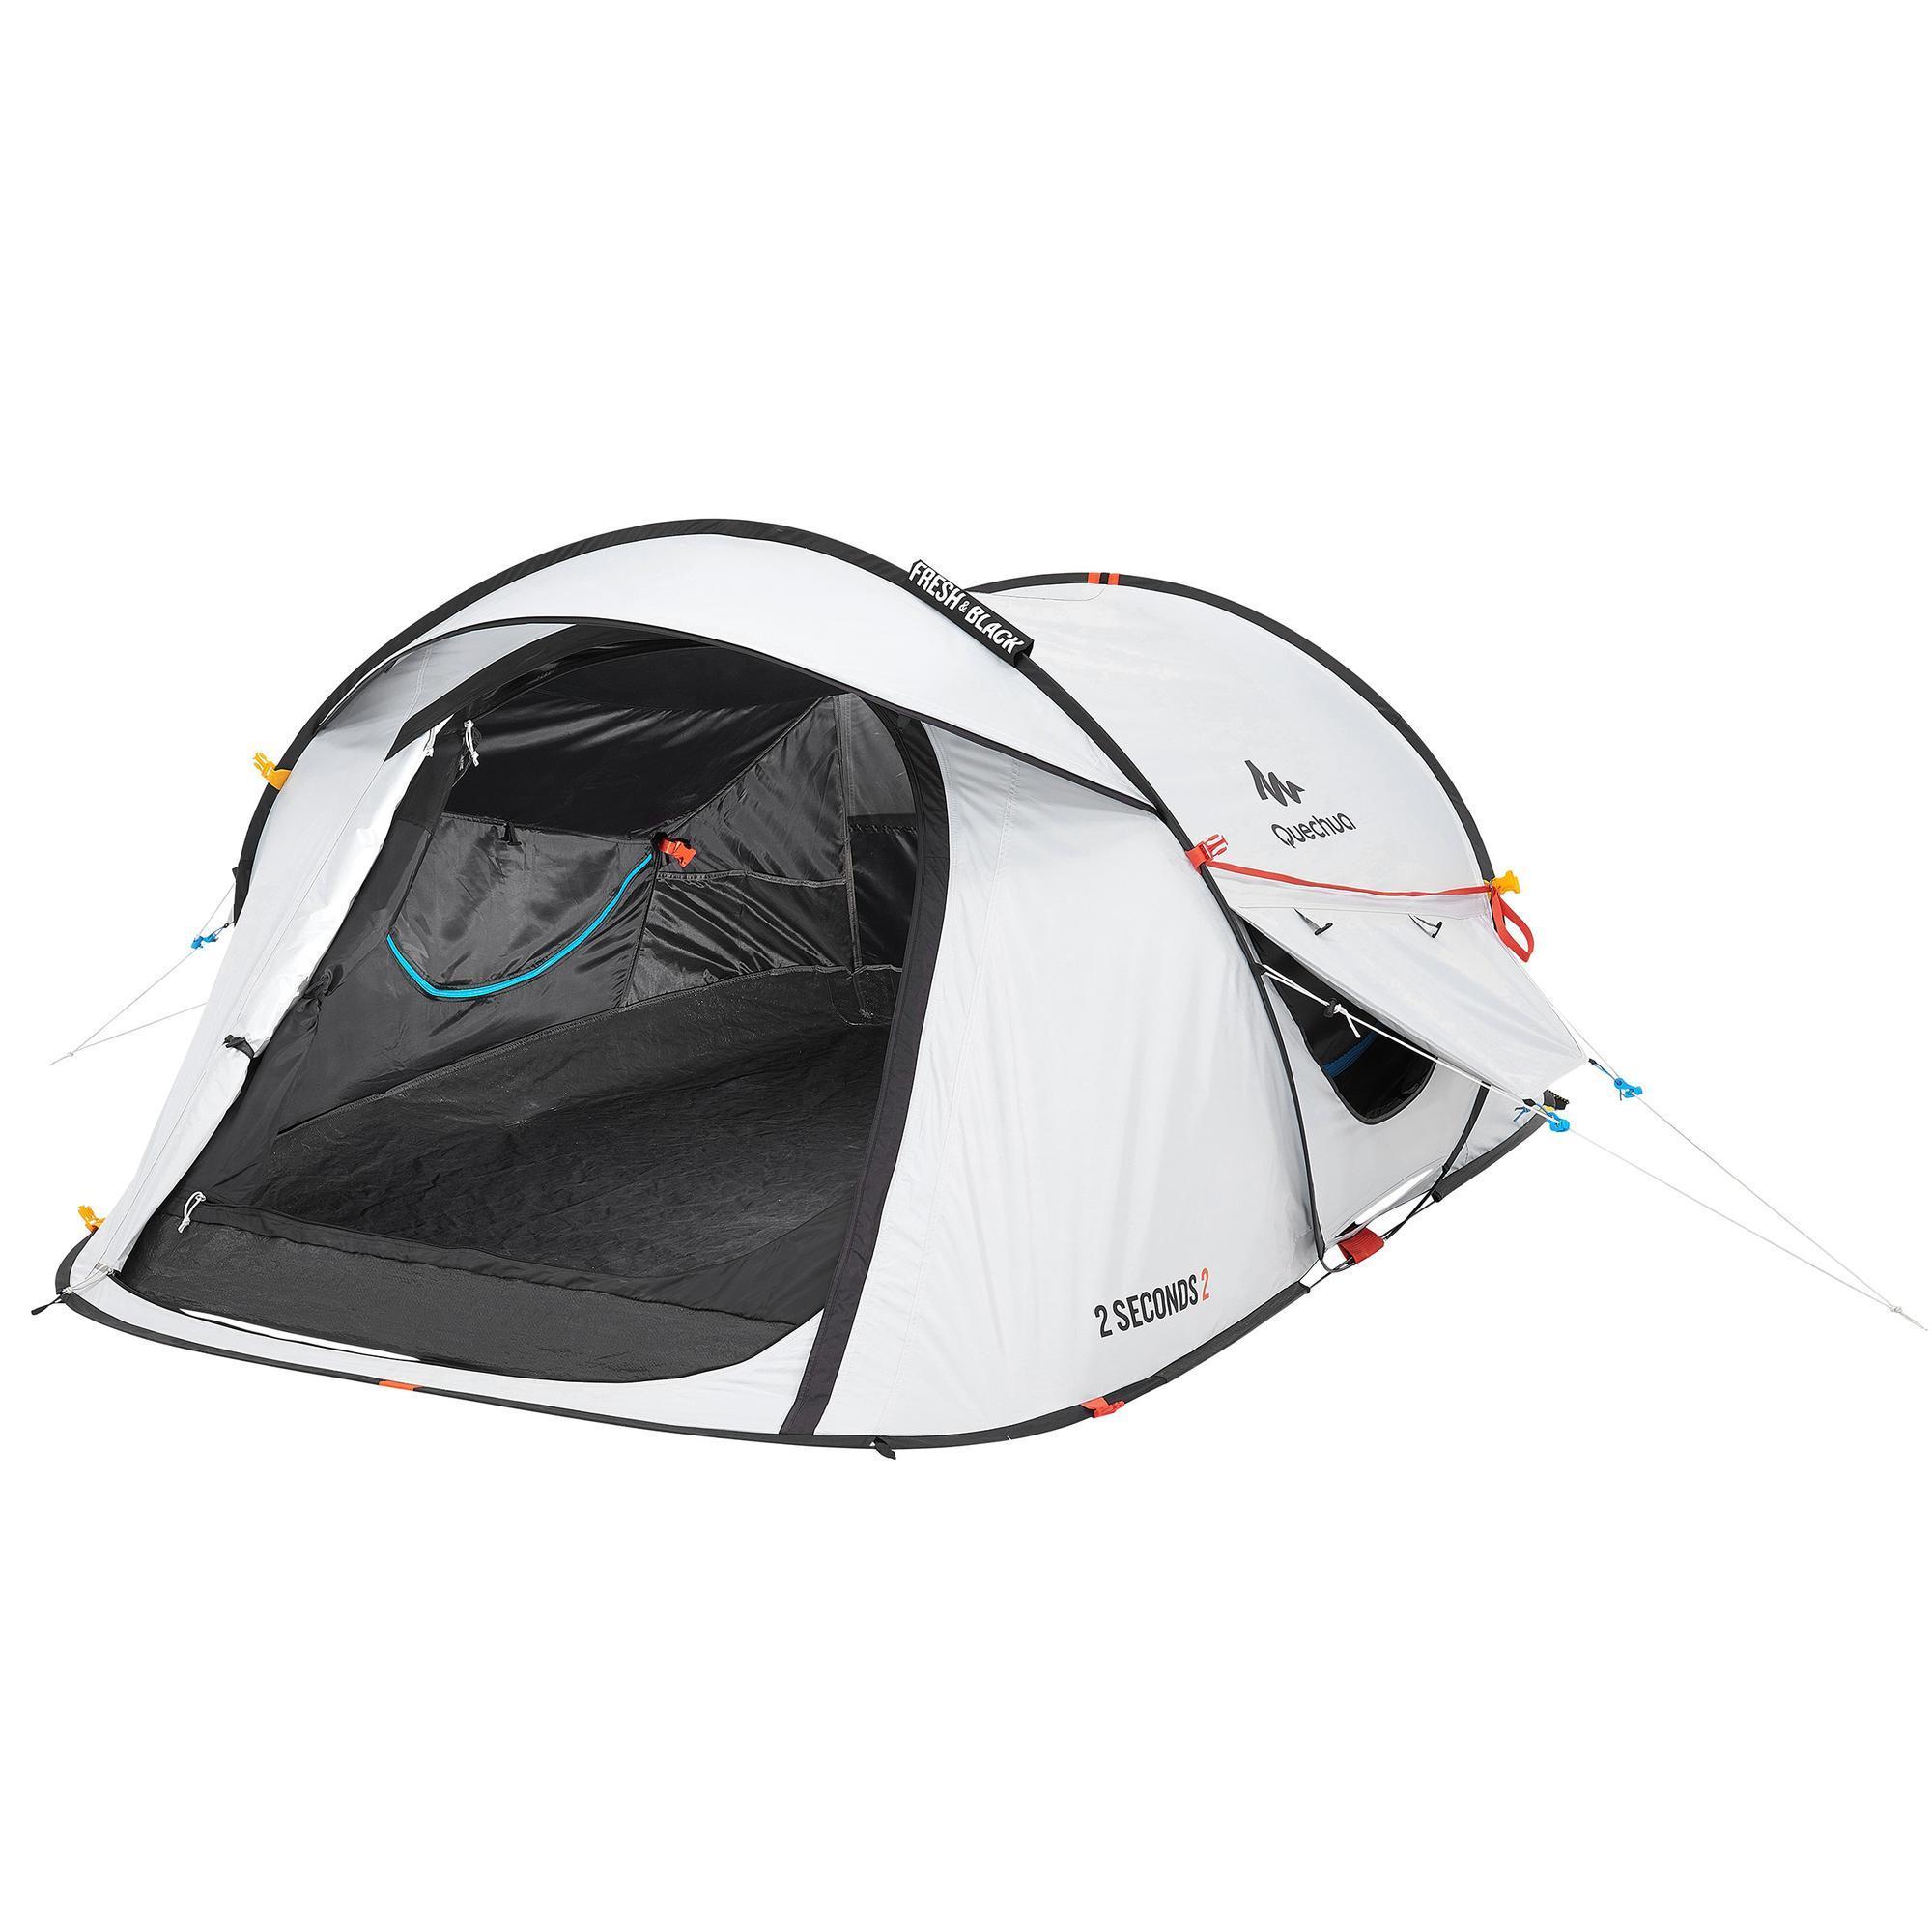 Quechua Tente De Camping 2 Seconds 2 Fresh Black 2 Personnes